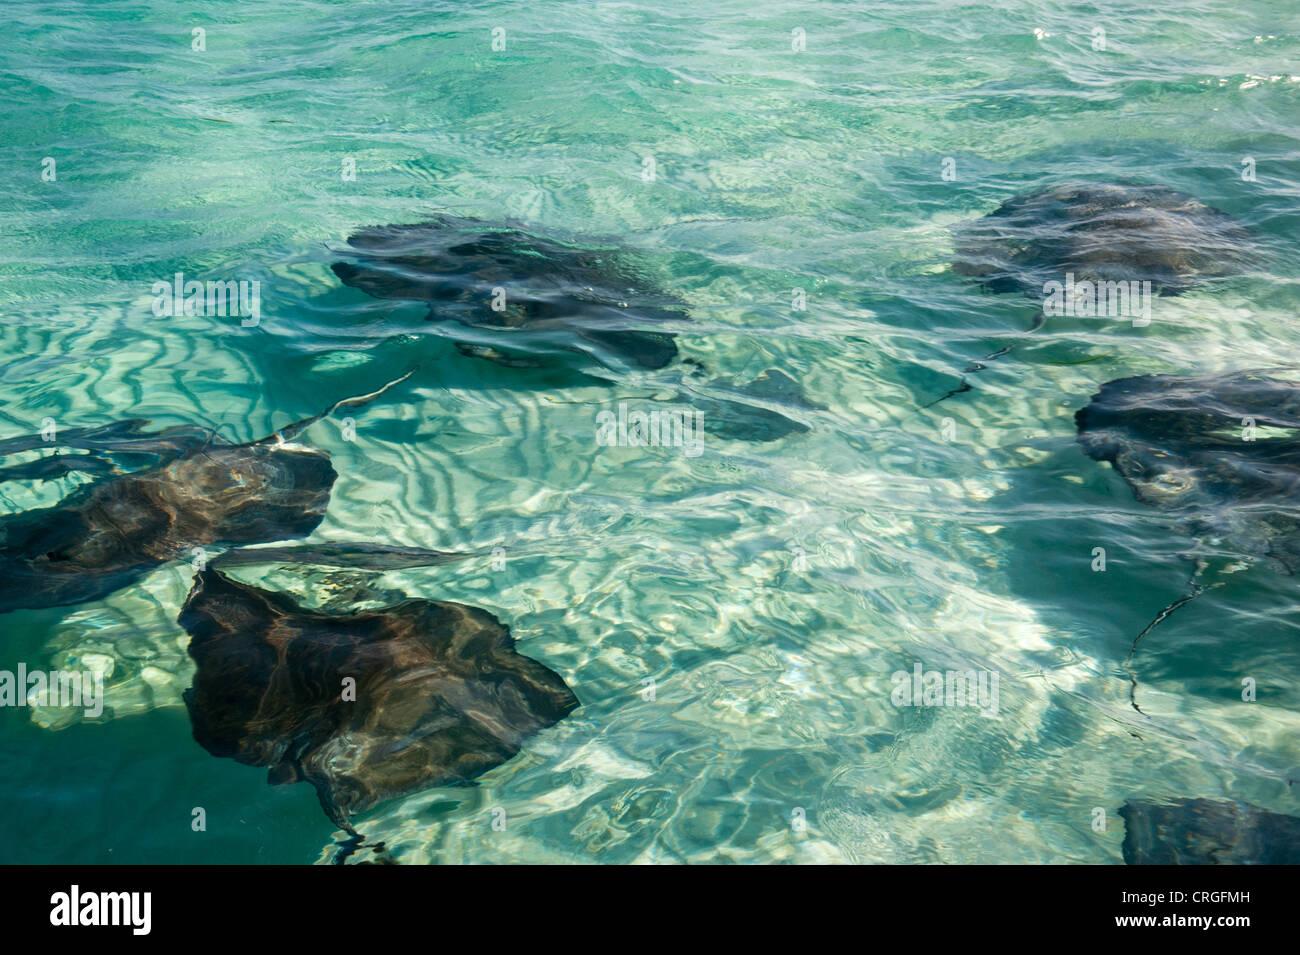 Stingray at Stingray City, Grand Cayman - Stock Image